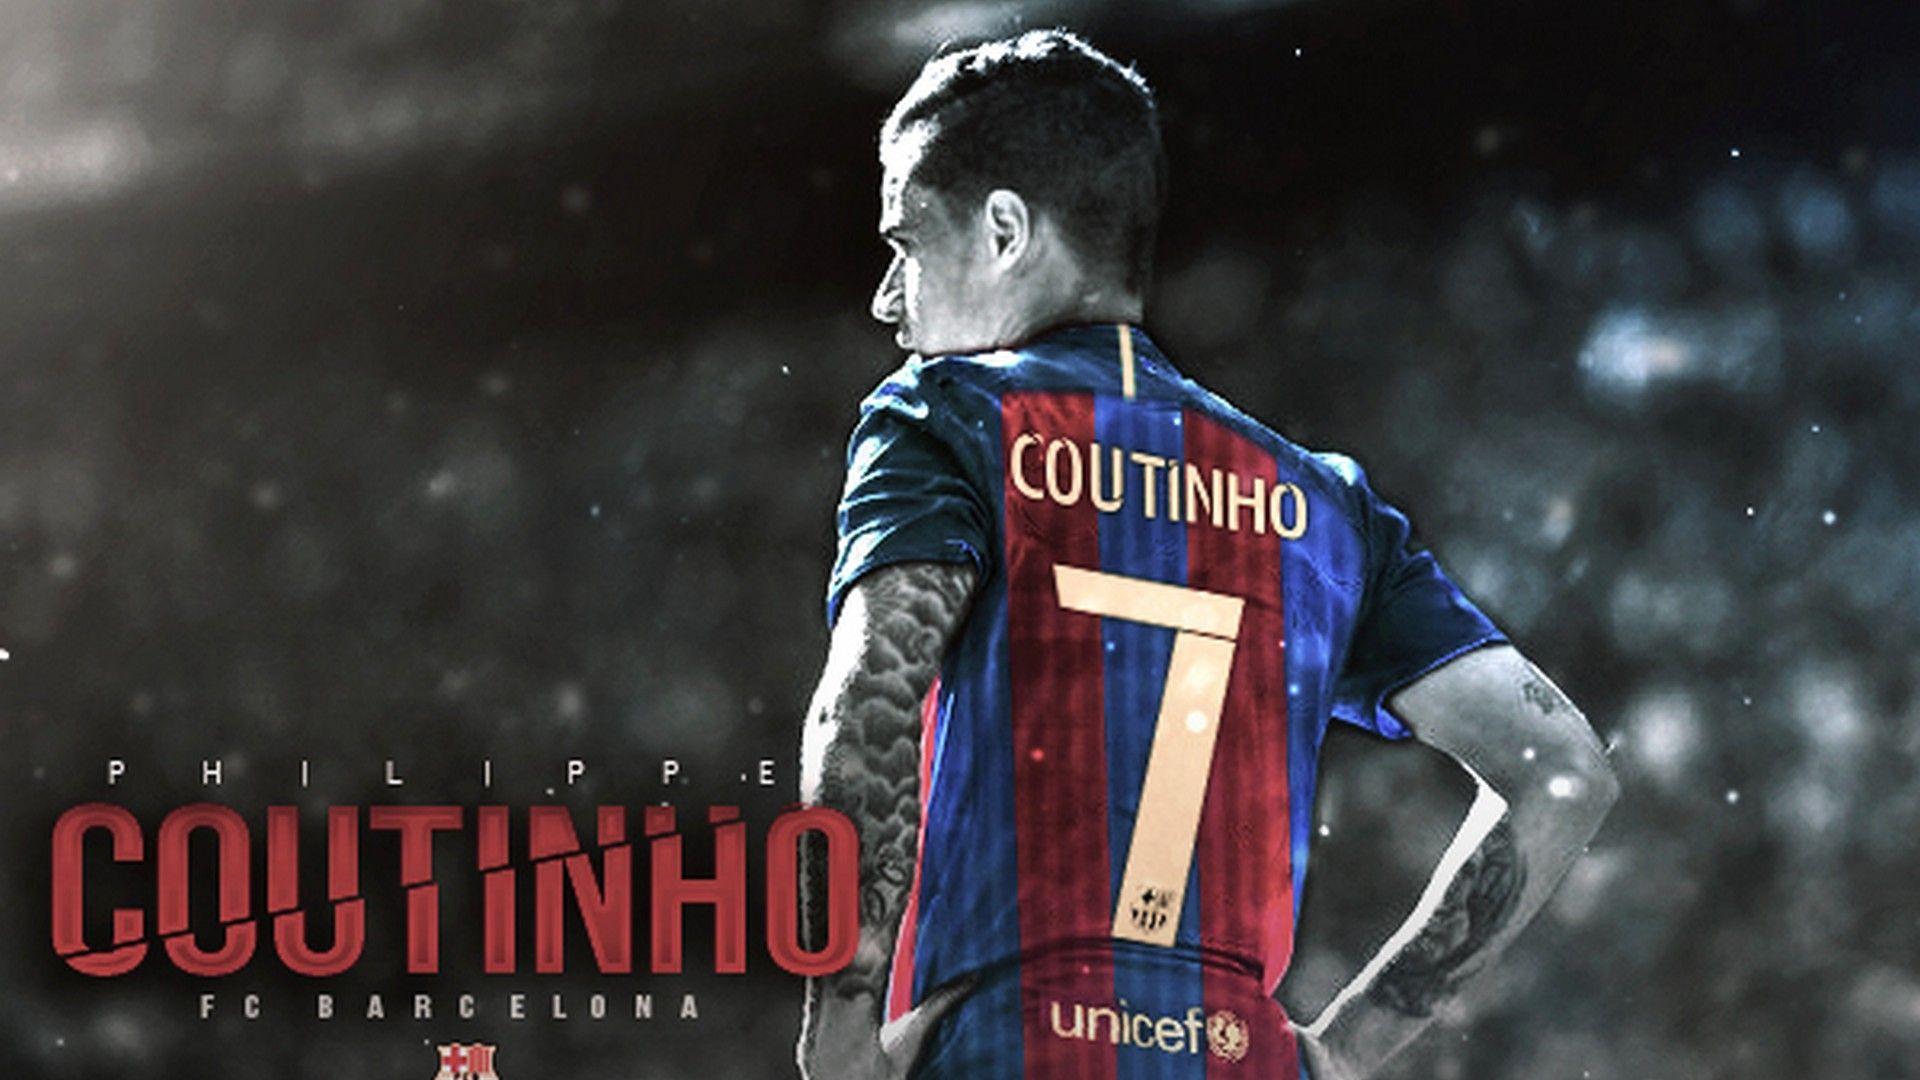 Coutinho barcelona wallpaper hd wallpaper wallpaper - Coutinho wallpaper hd ...